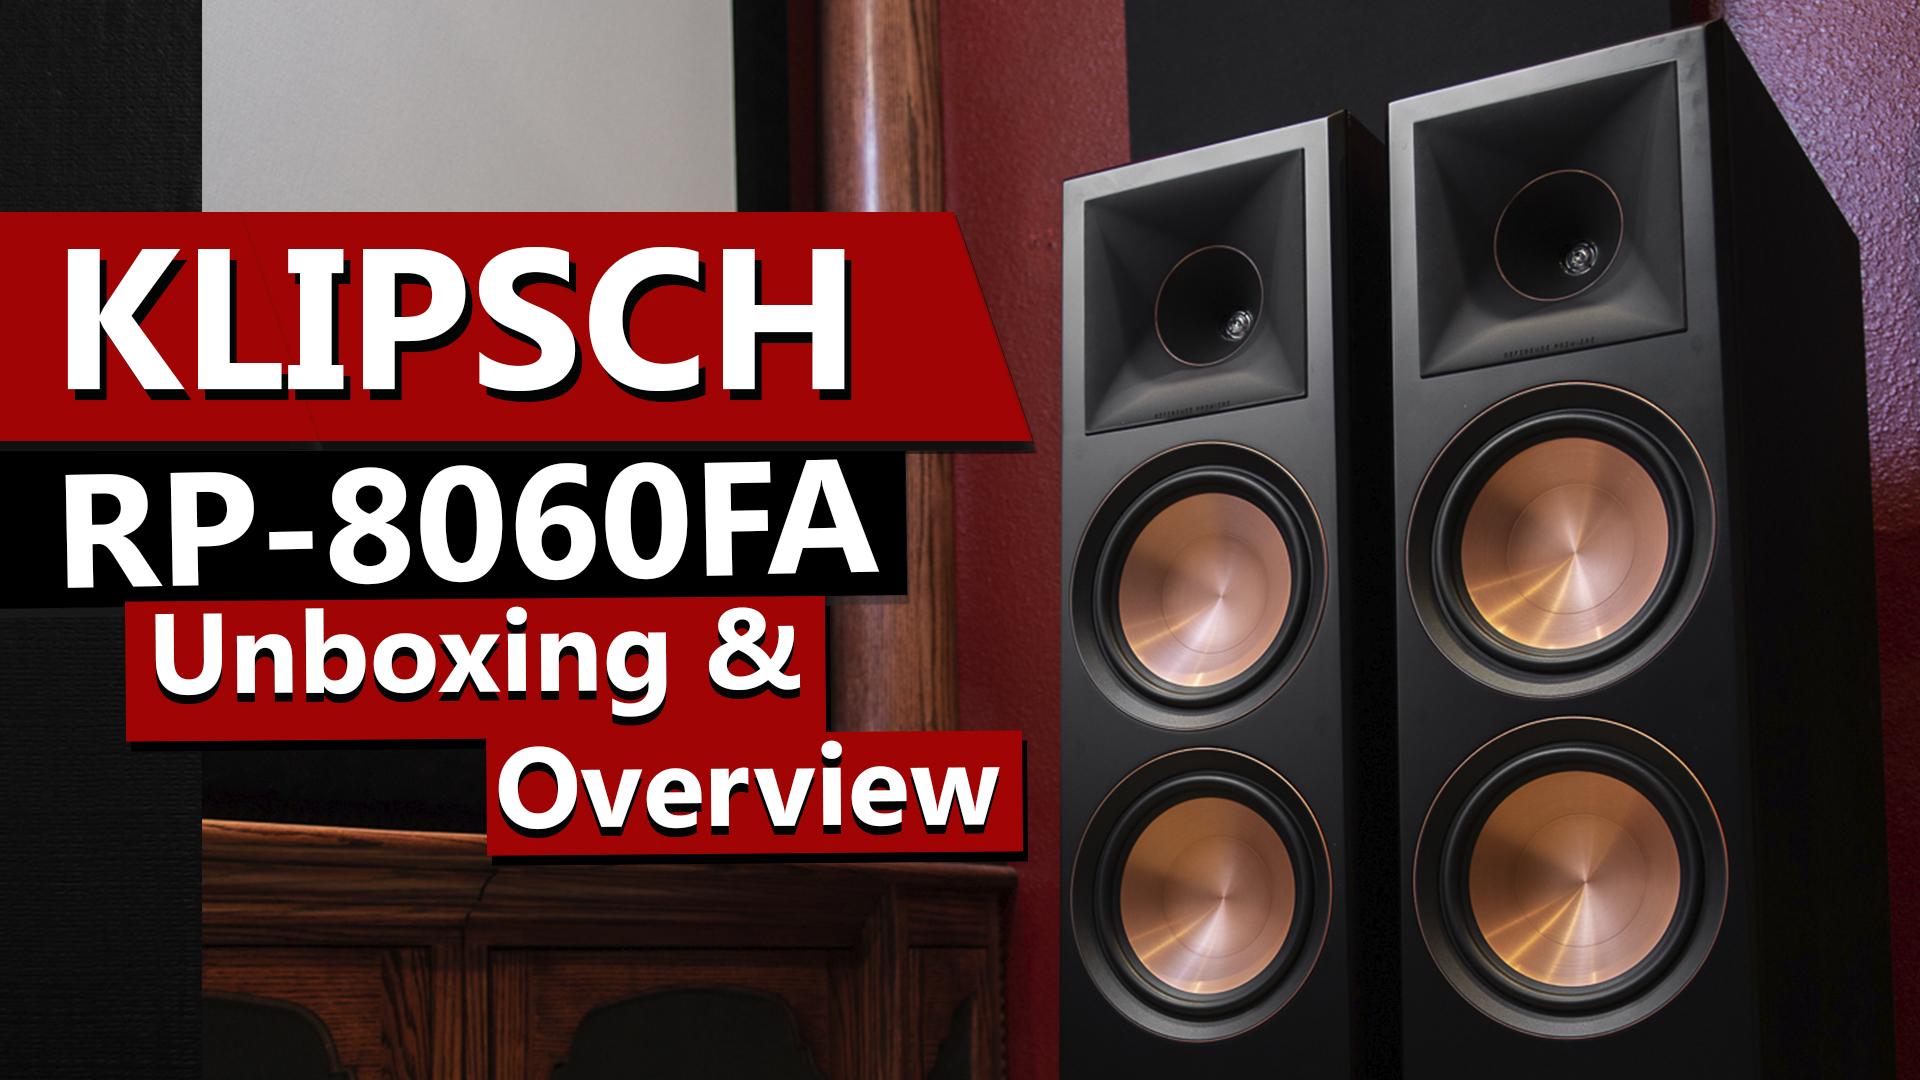 Klipsch RP-8060FA Dolby Atmos Floorstanding Speakers